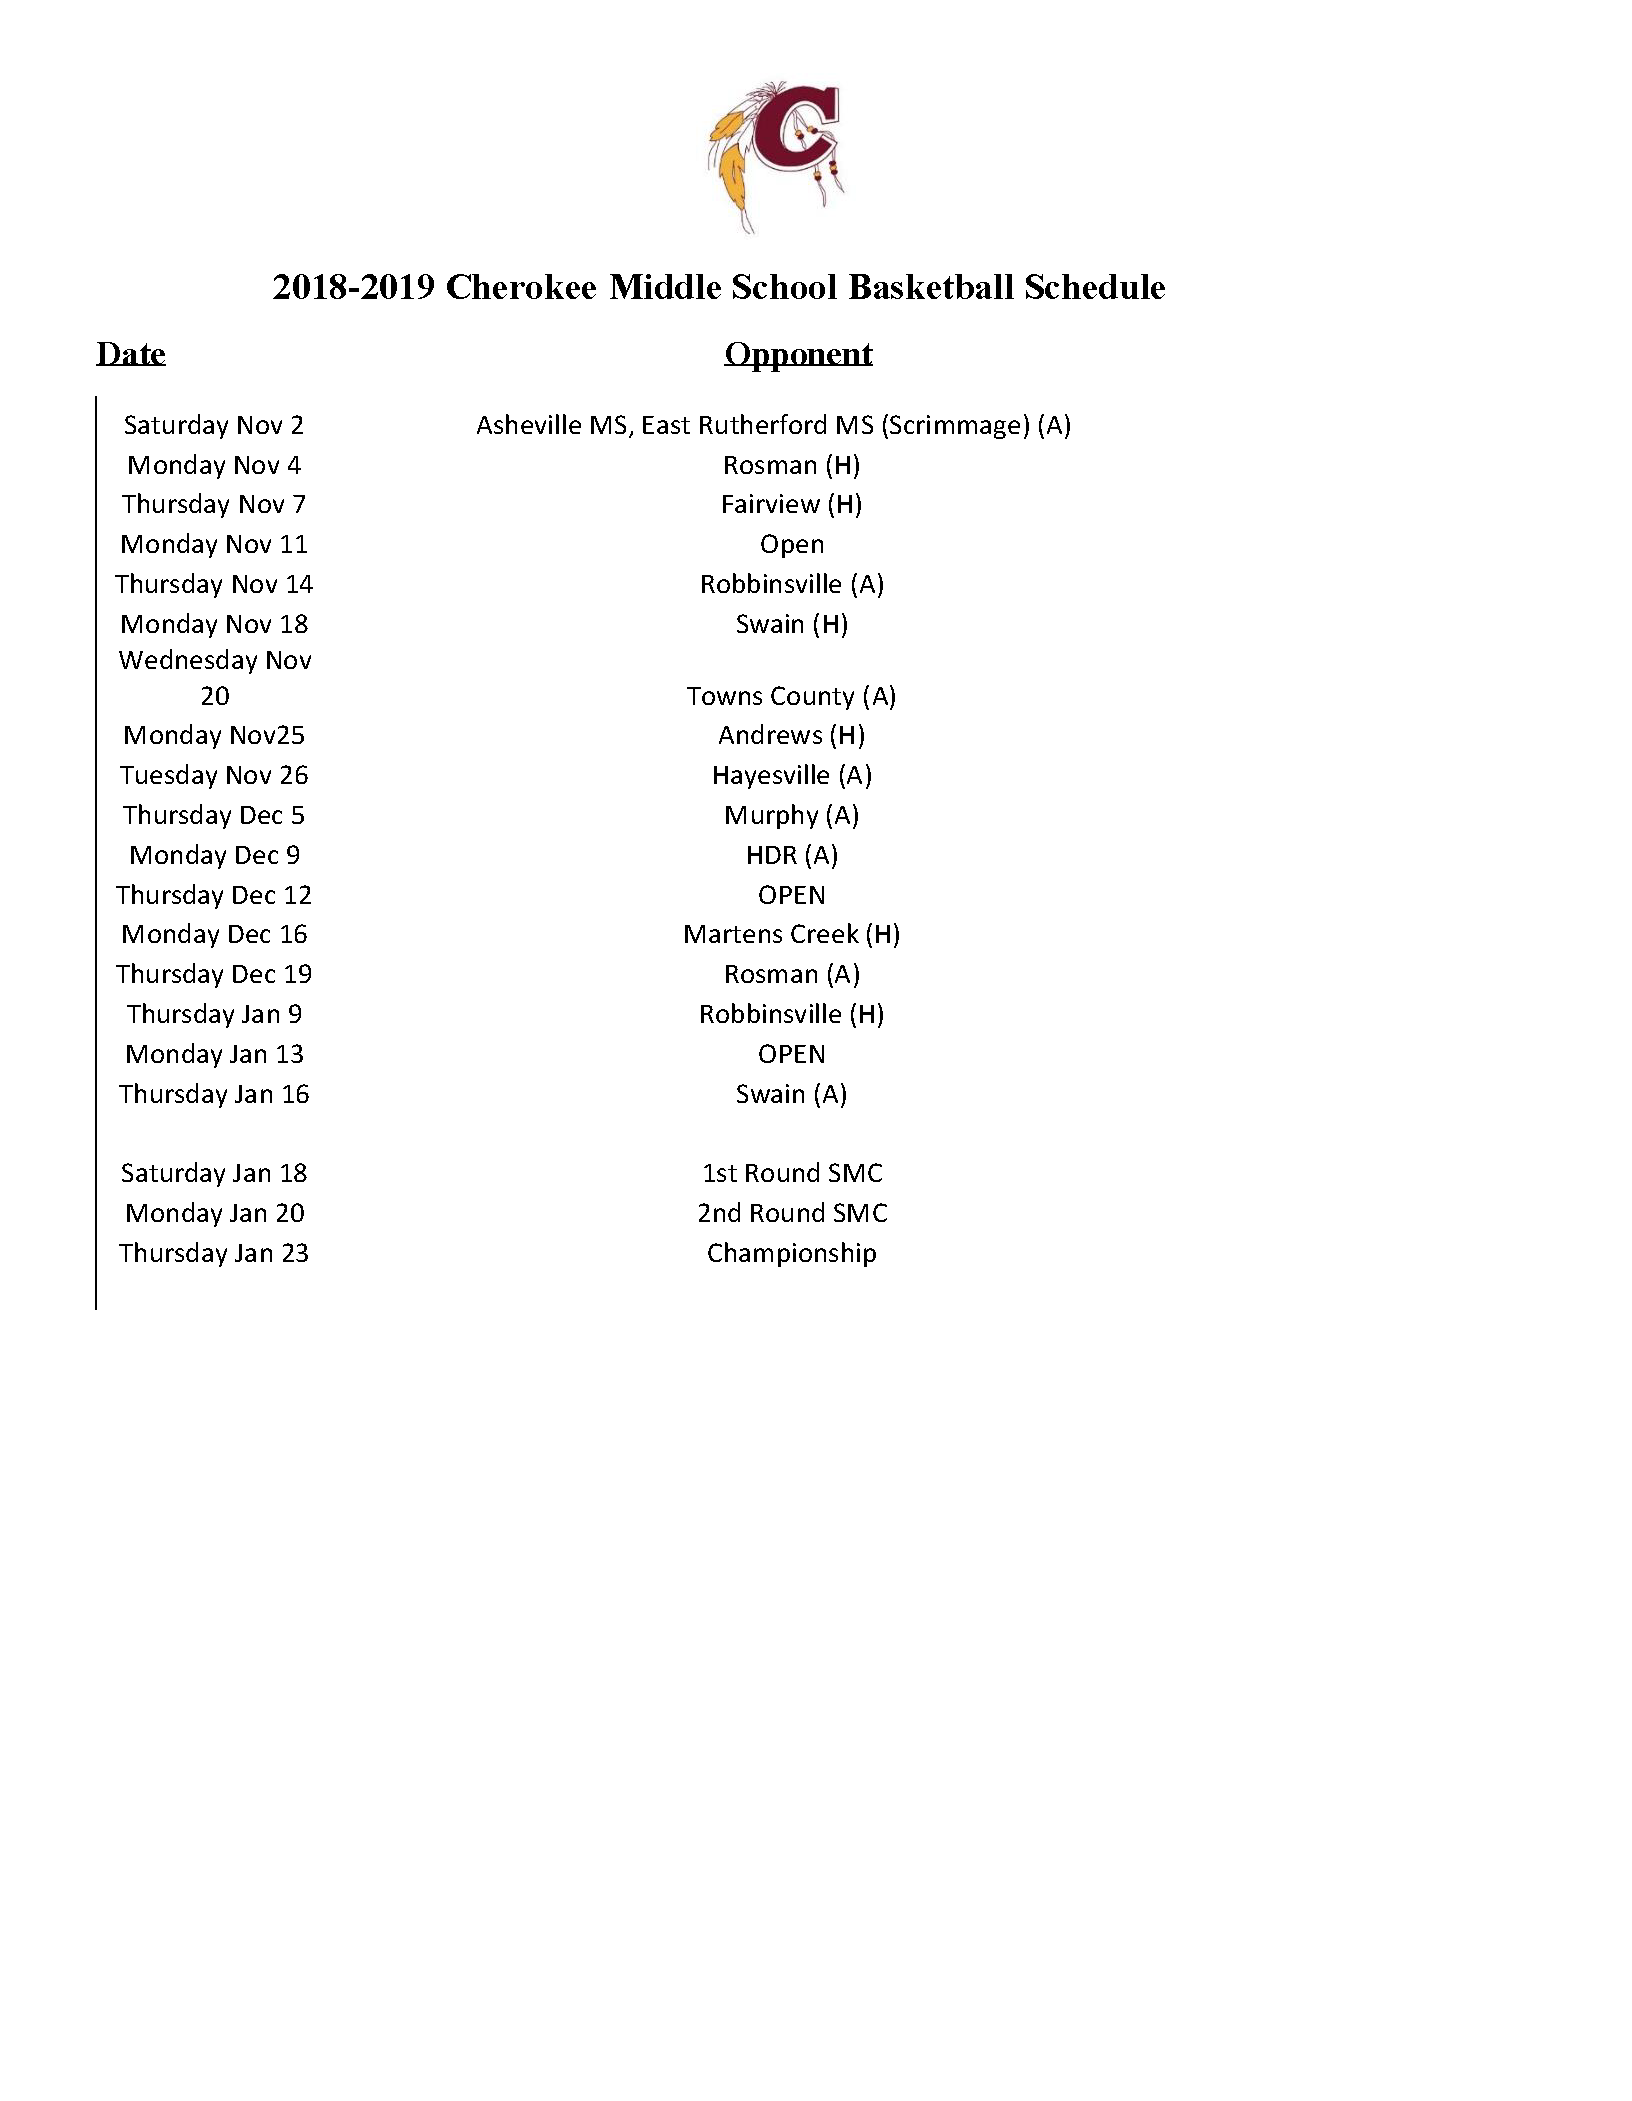 2019-2020 CMS Basketball Schedule